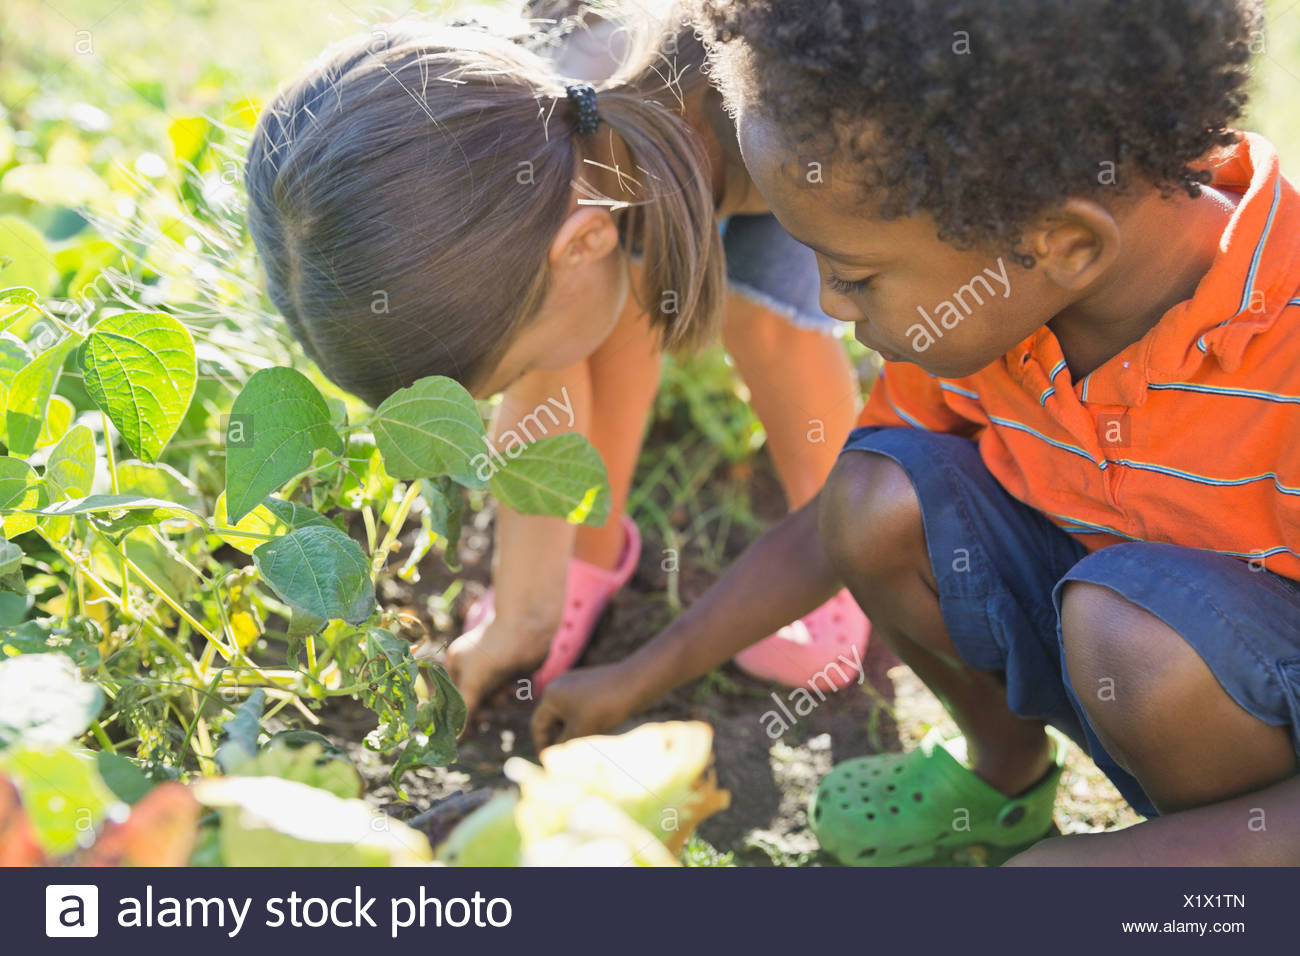 Children gardening together - Stock Image